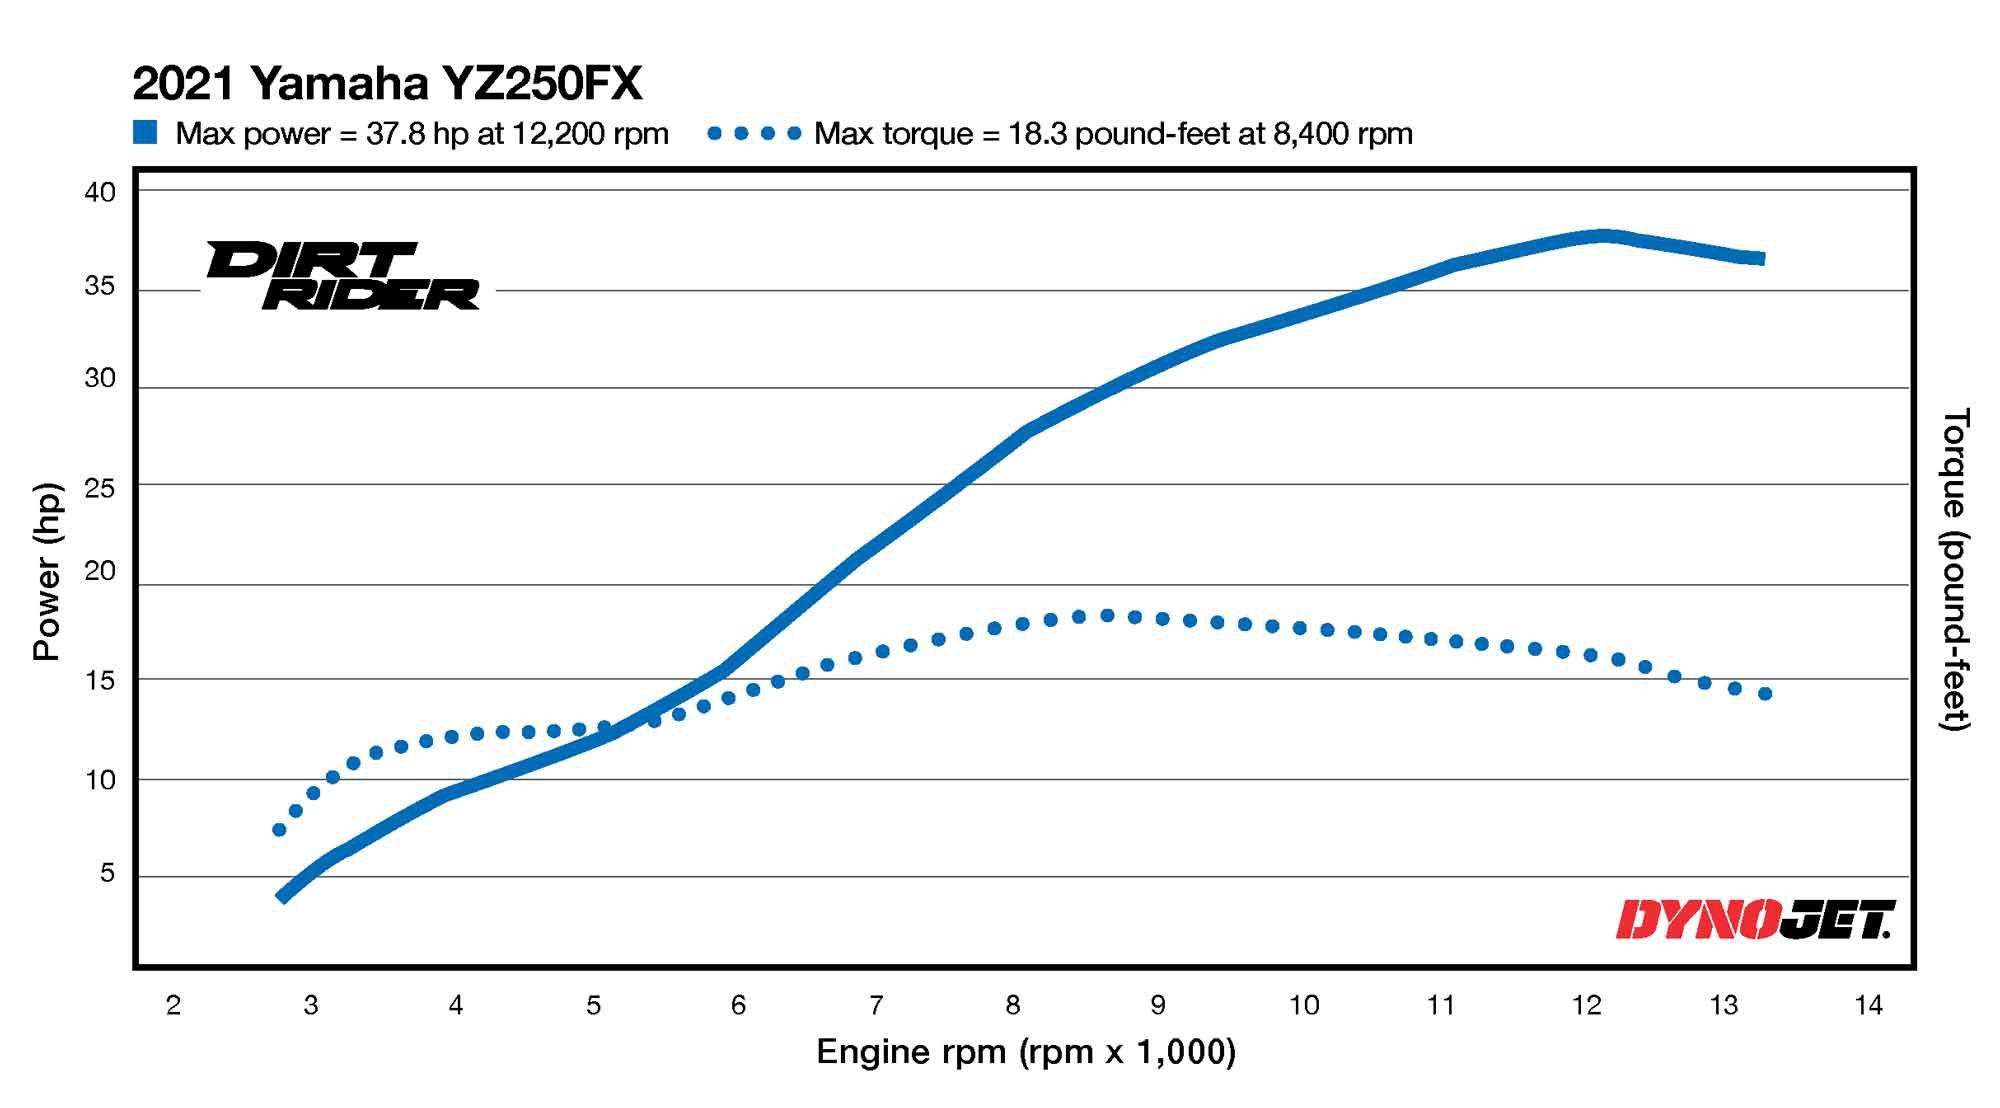 2021 Yamaha YZ250FX Dyno Test